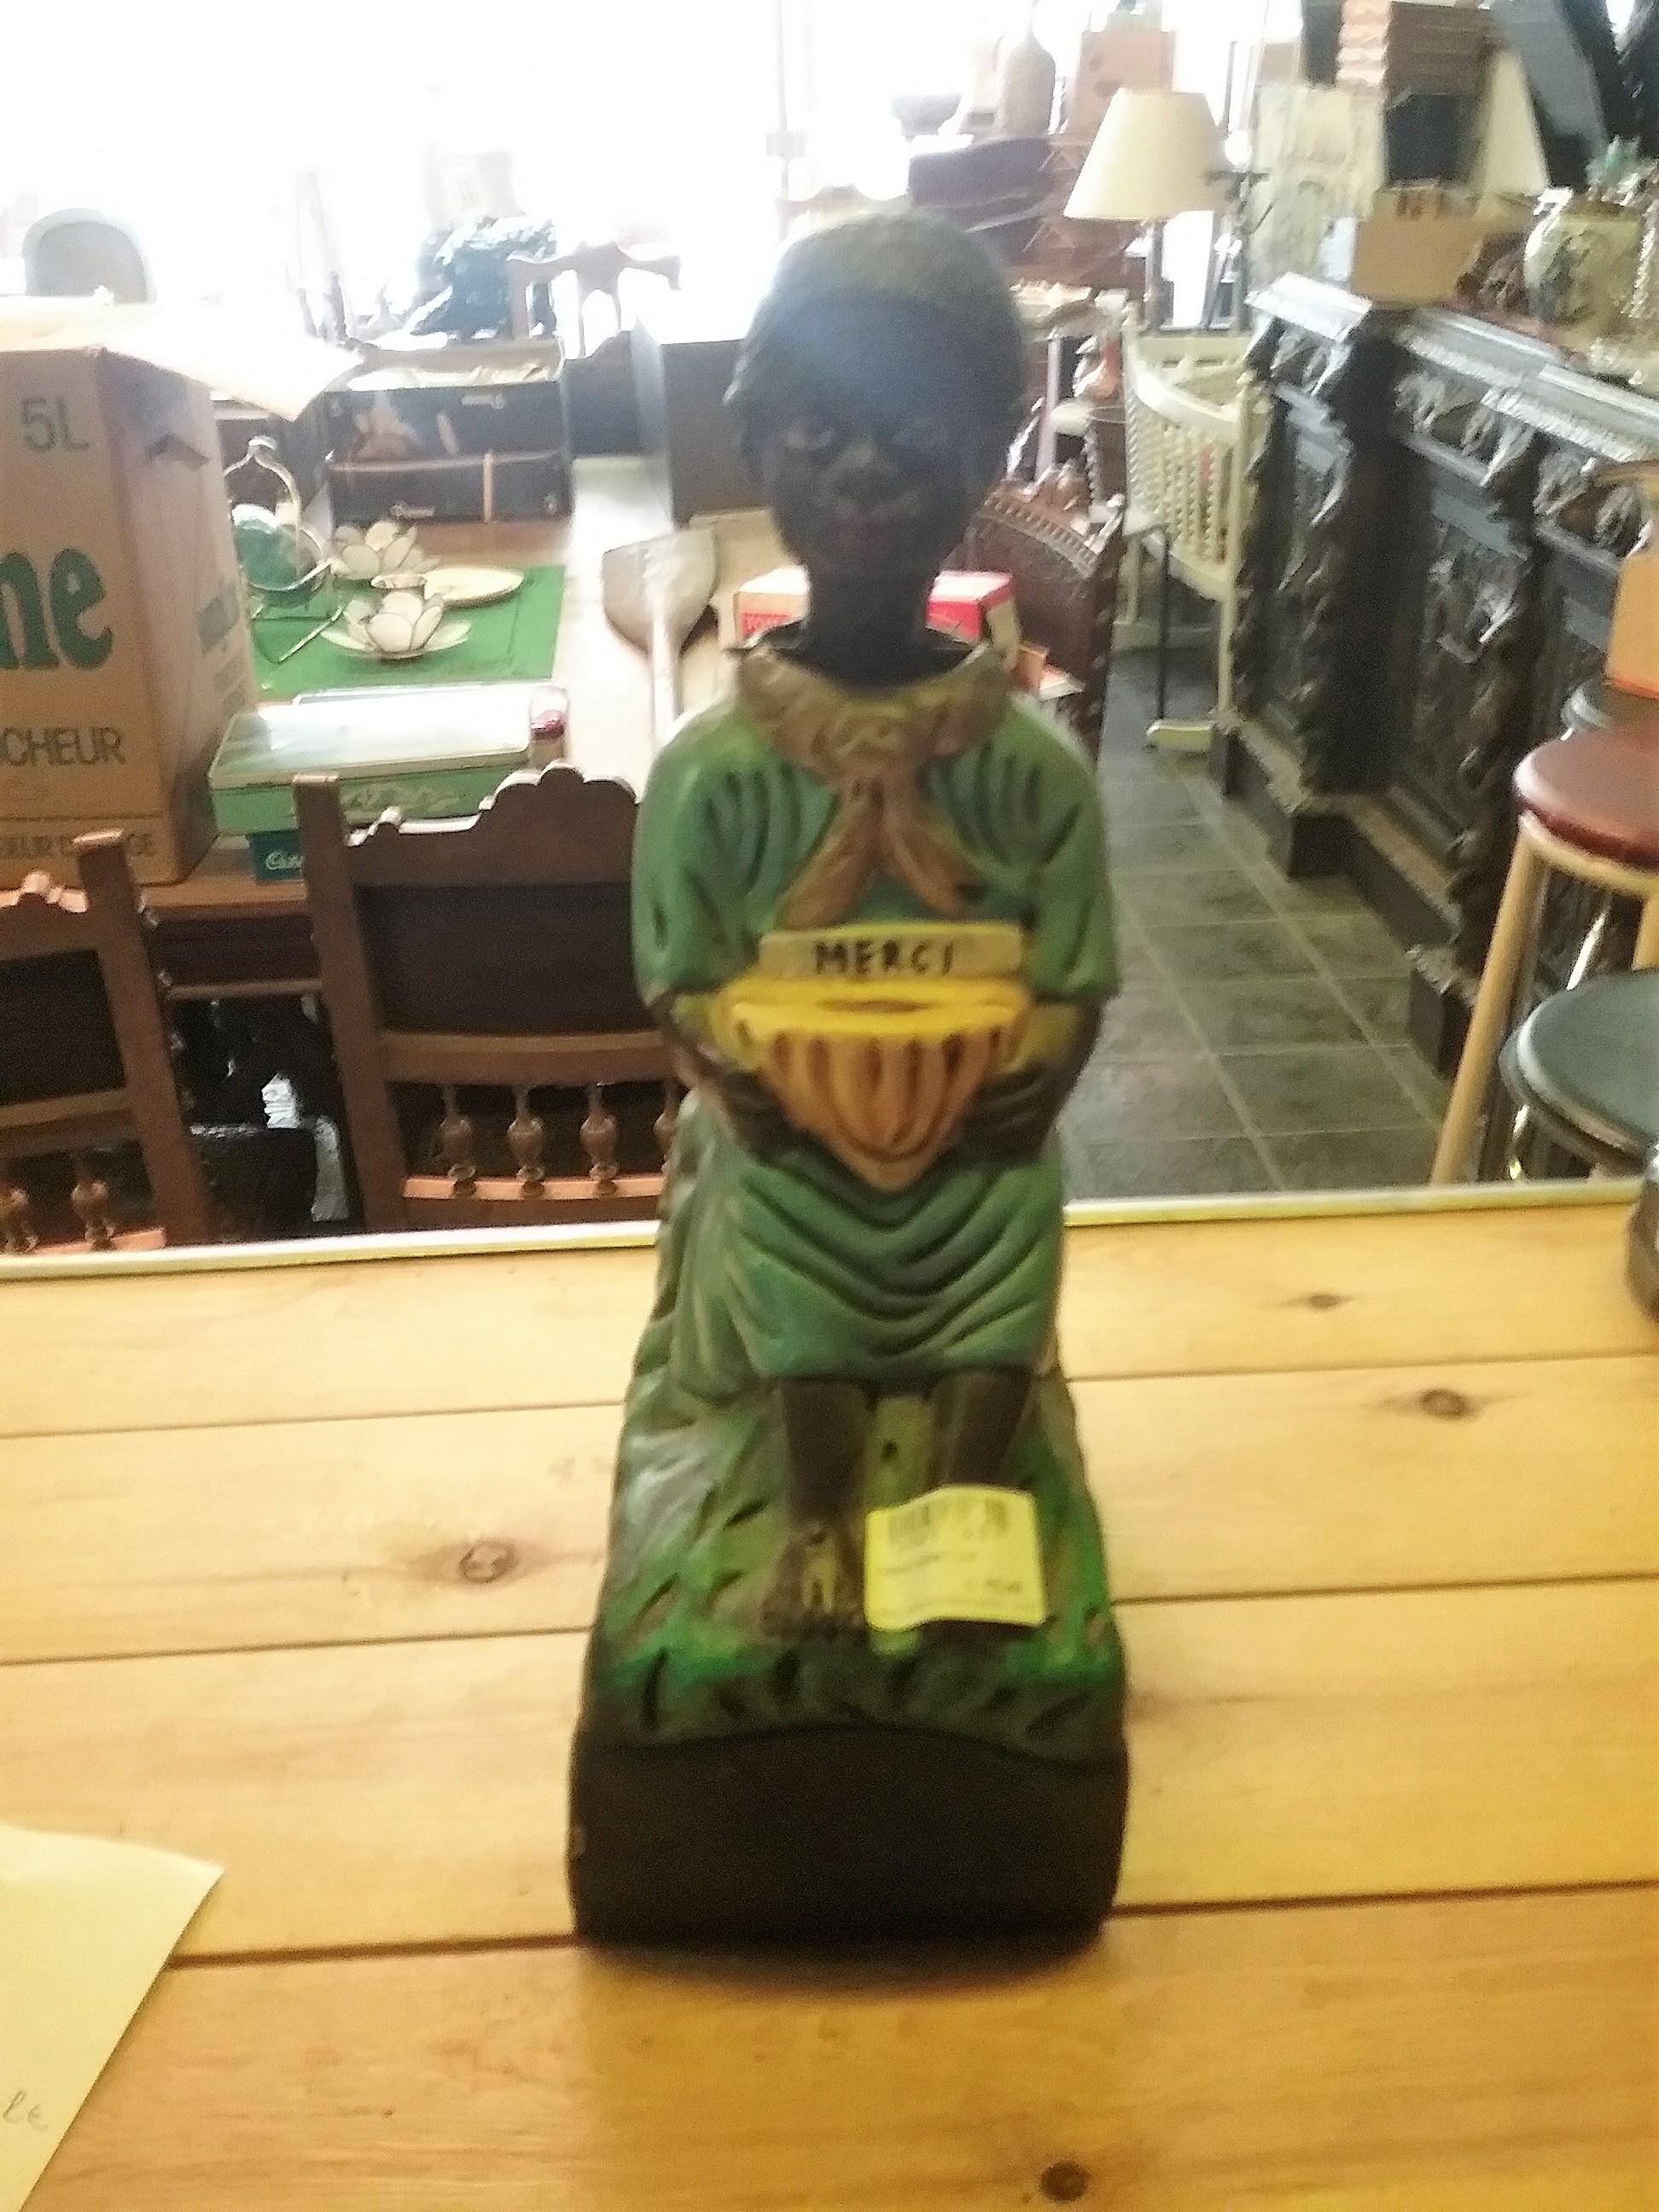 Merano vase brocante cafe digital nostalgia related products reviewsmspy